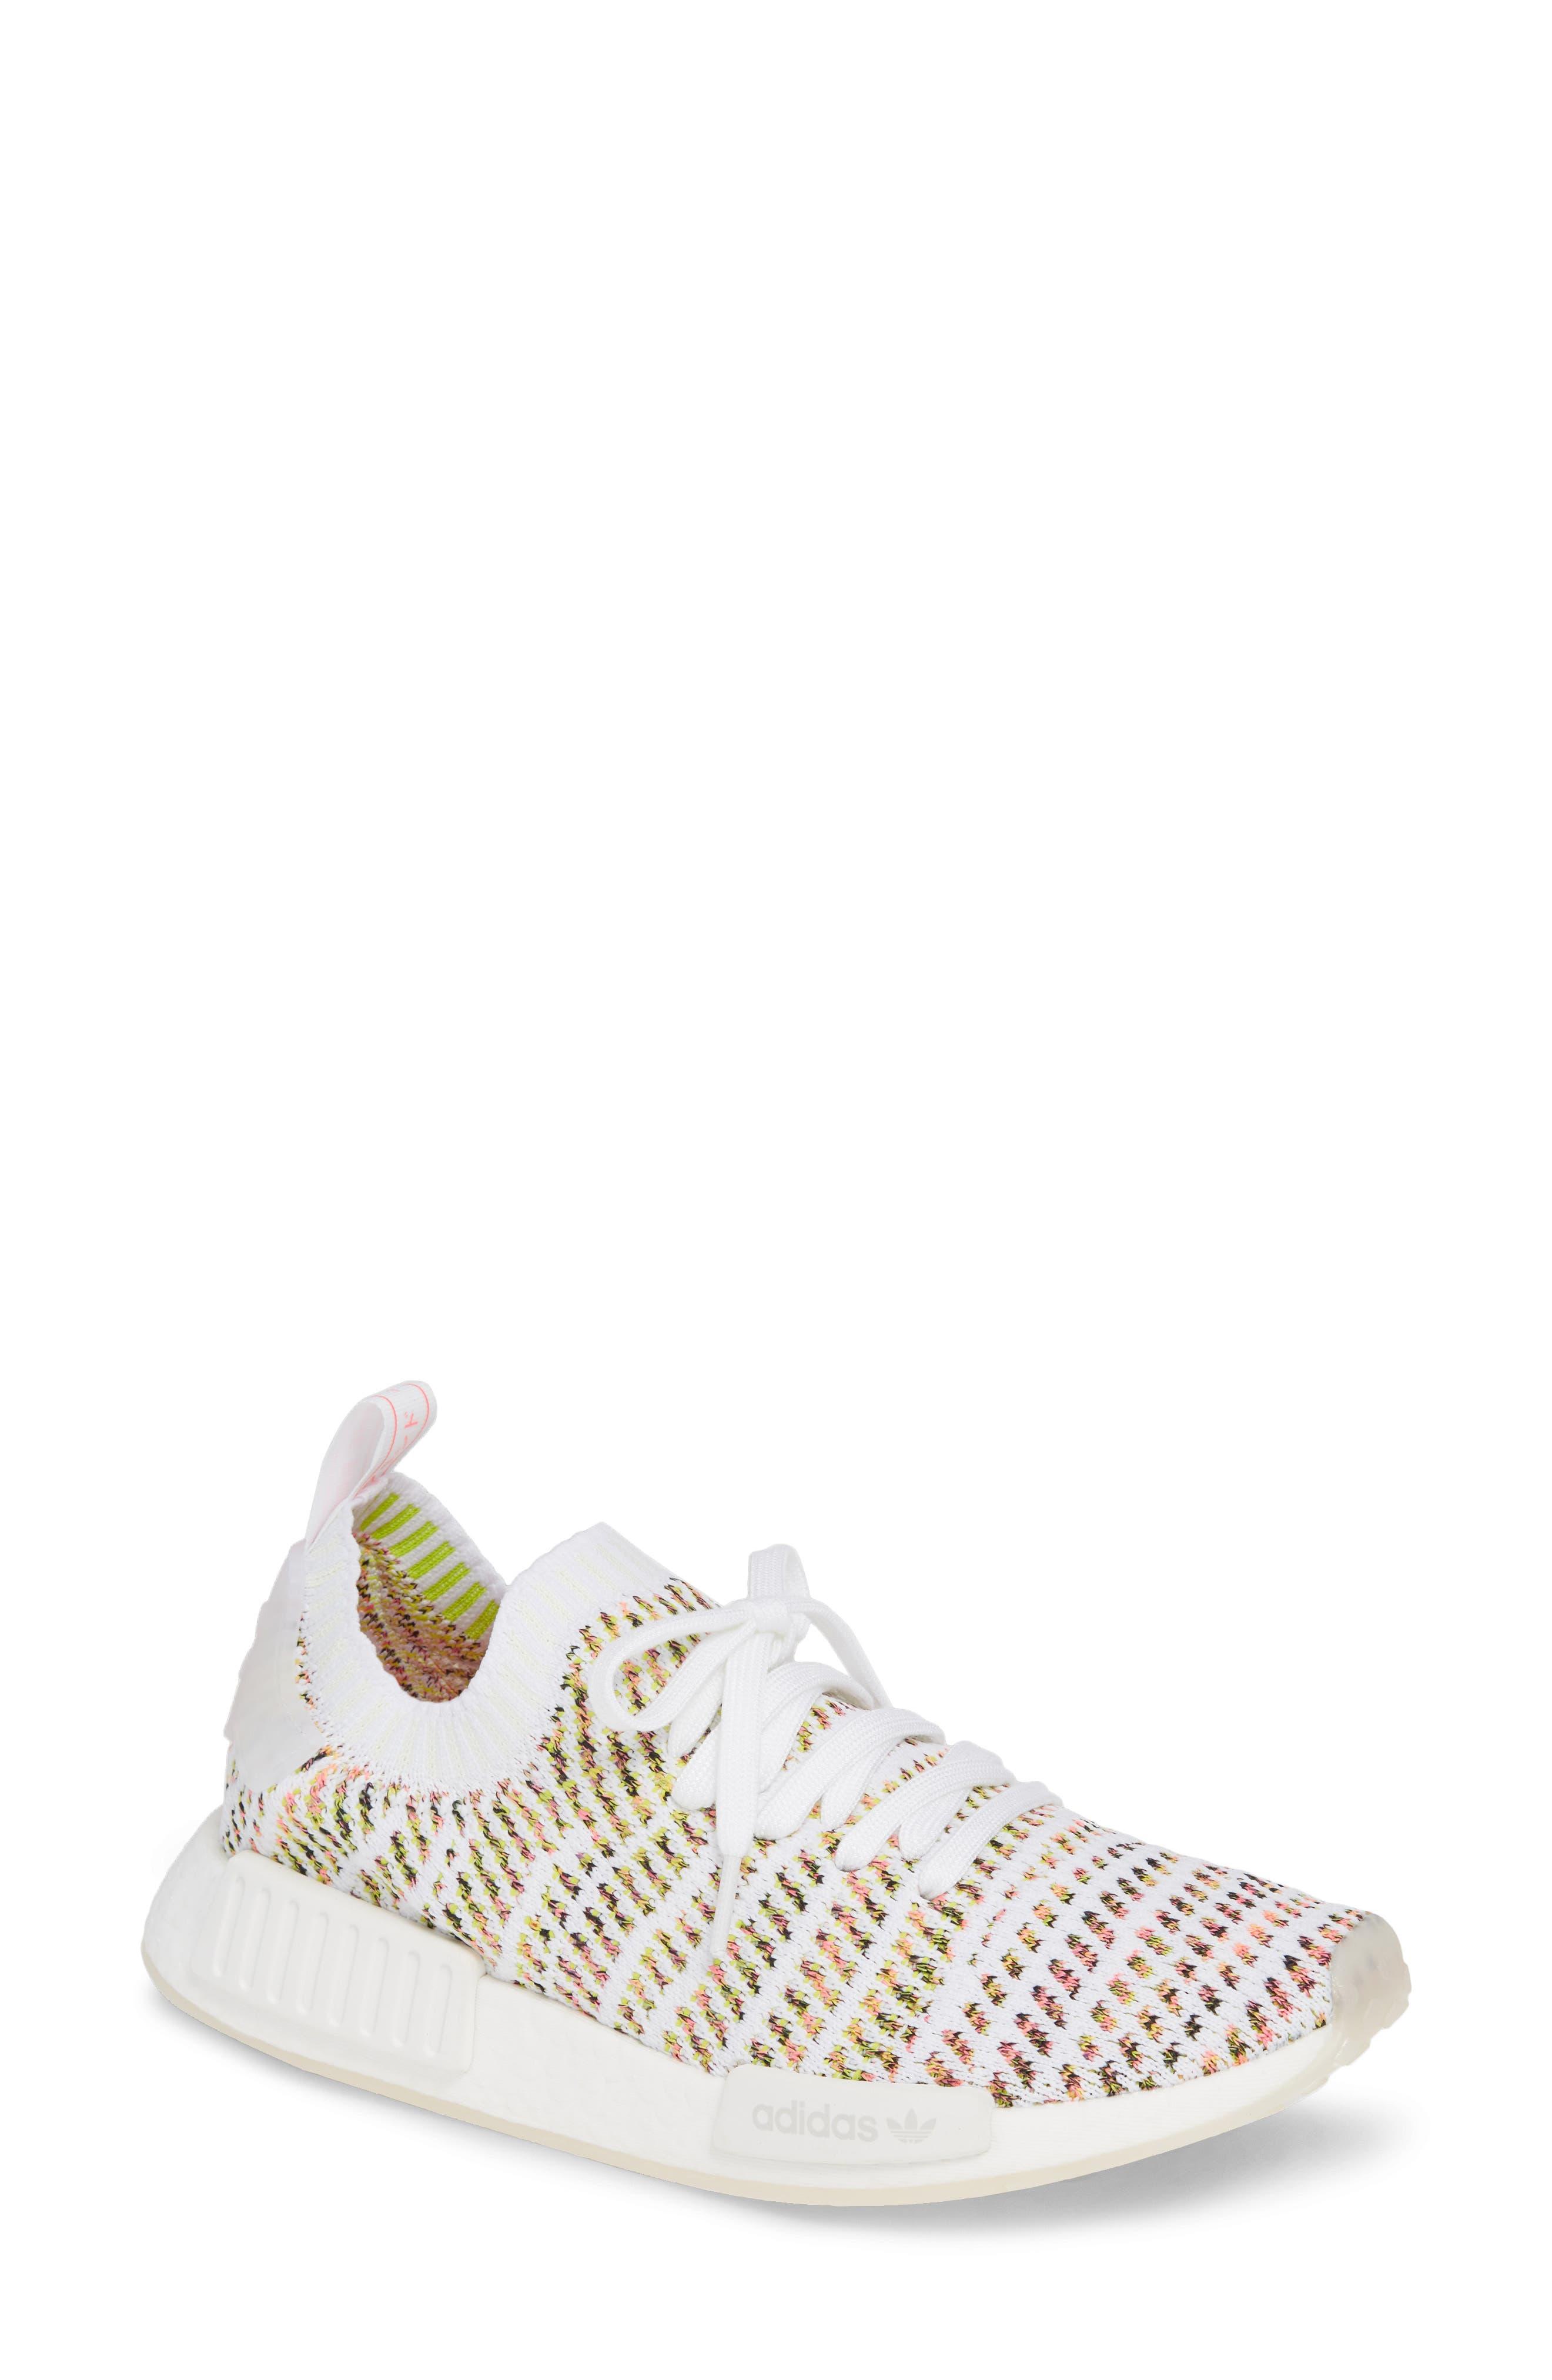 NMD R1 STLT Primeknit Sneaker,                         Main,                         color, WHITE/ YELLOW/ SOLAR PINK